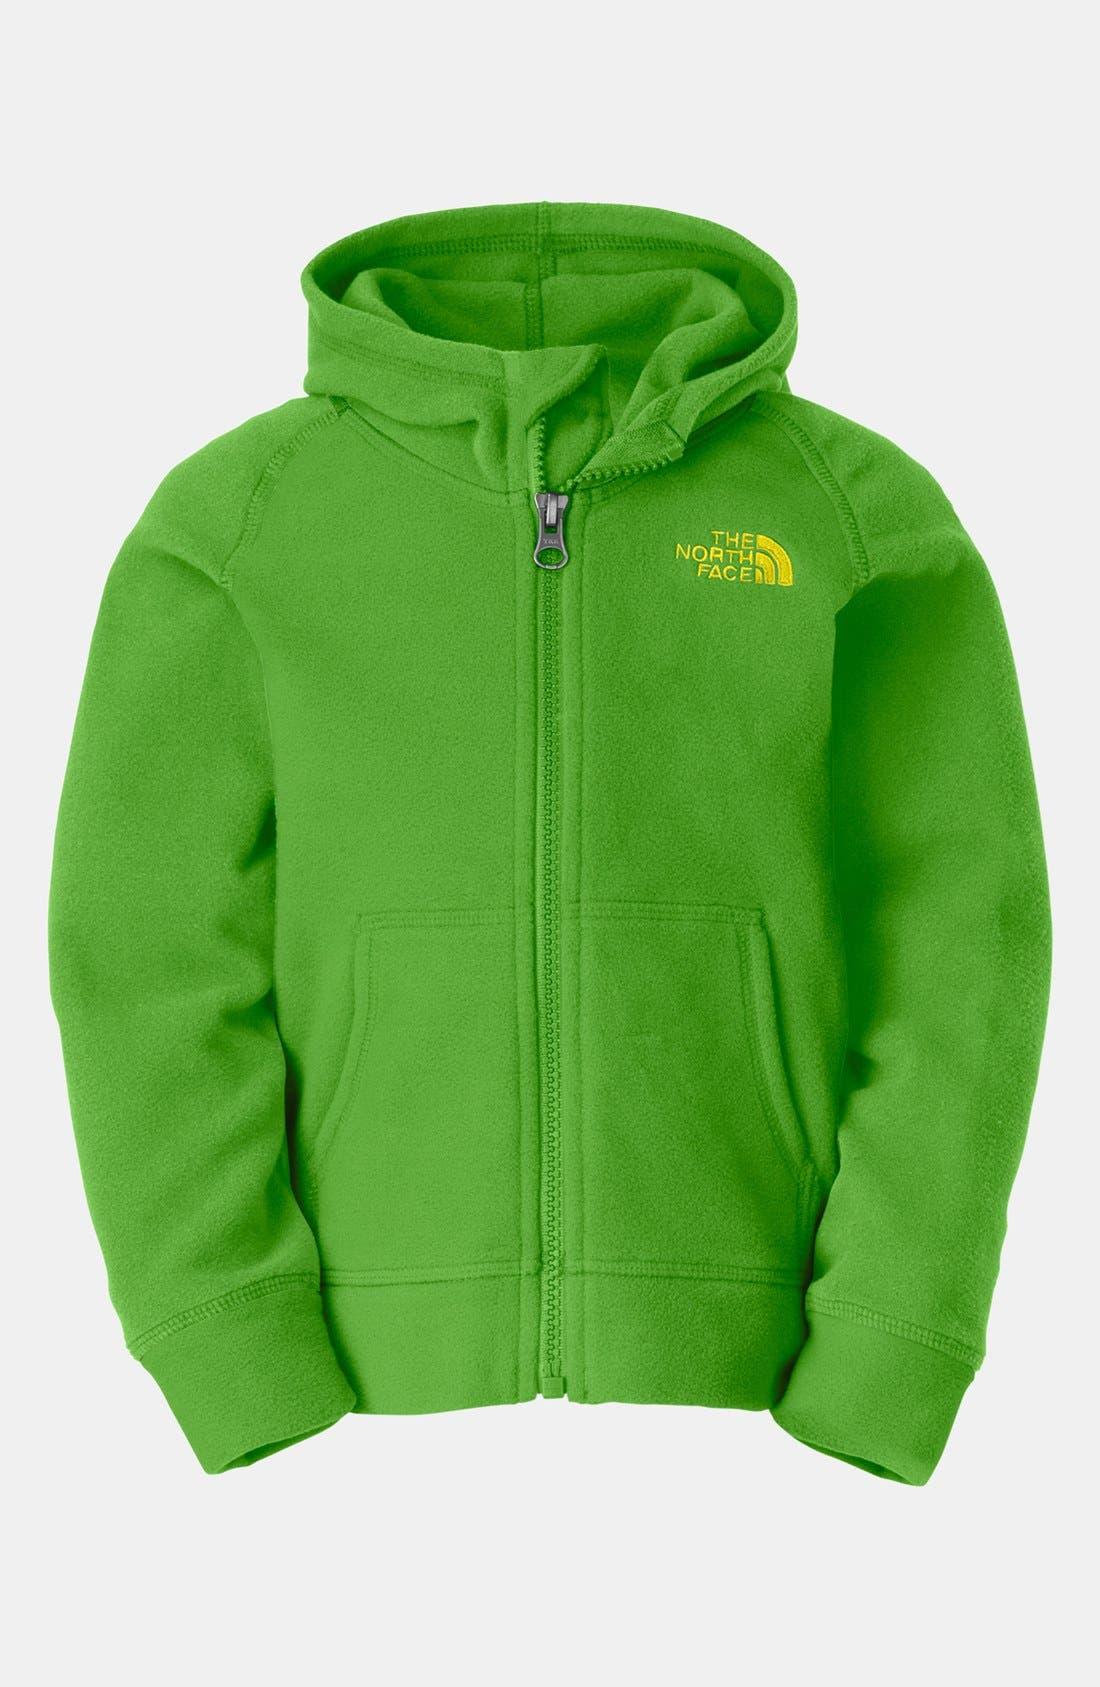 Main Image - The North Face 'Glacier' Polartec® Fleece Hoodie (Toddler Boys)